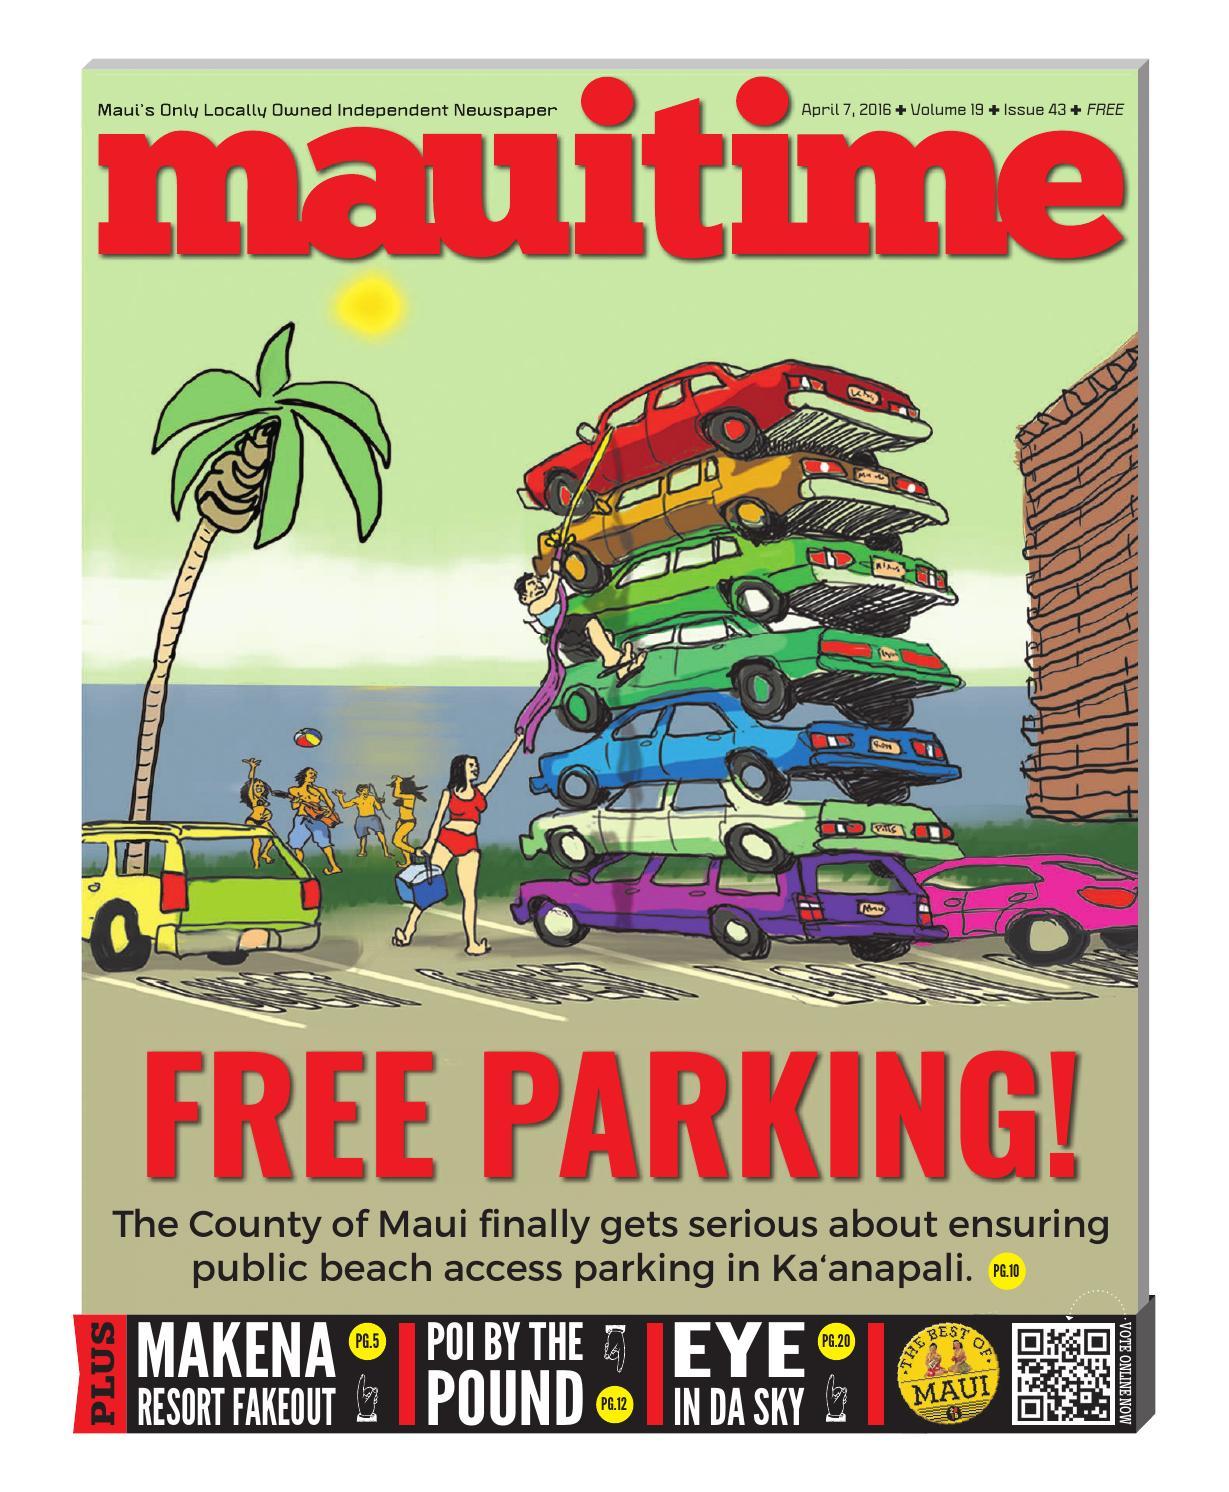 19 43 Free Parking - Maui County Public Beach Access, April